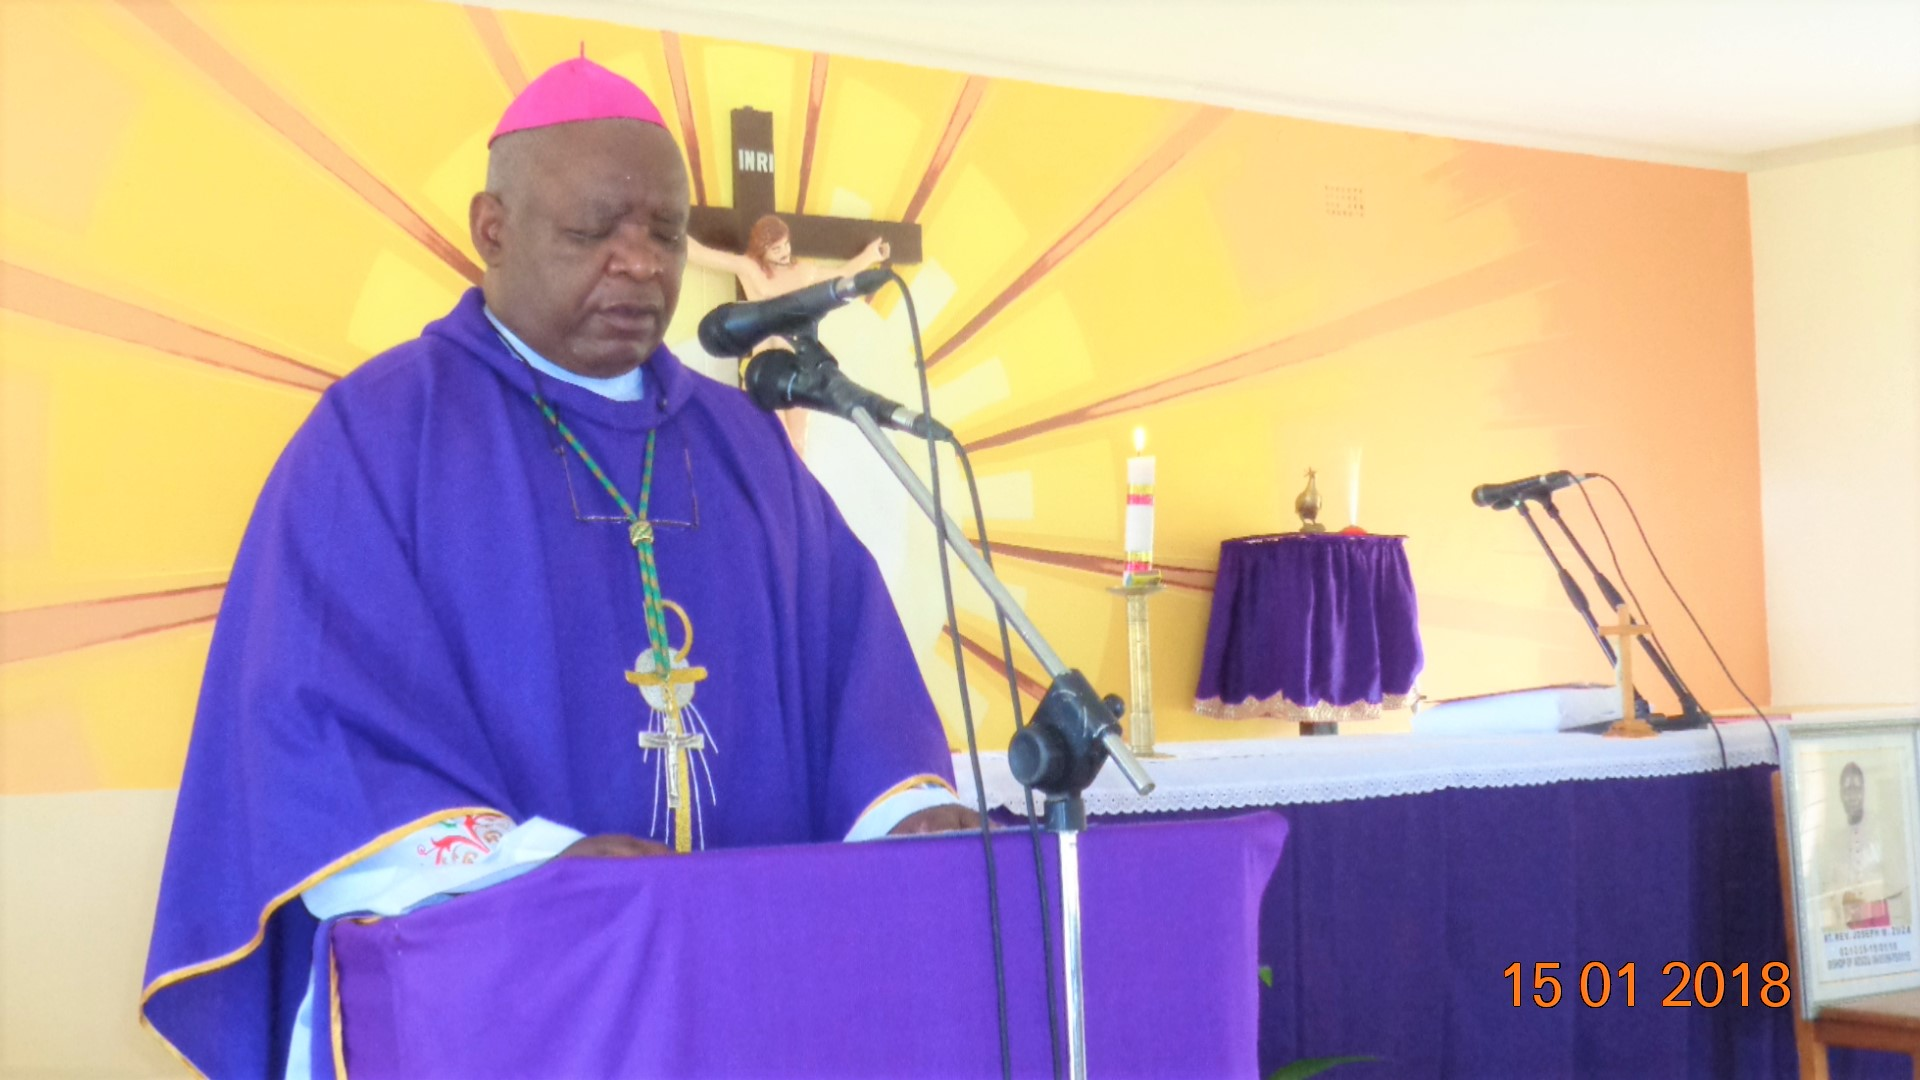 Karonga Diocese Commemorates the Life of Bishop Zuza